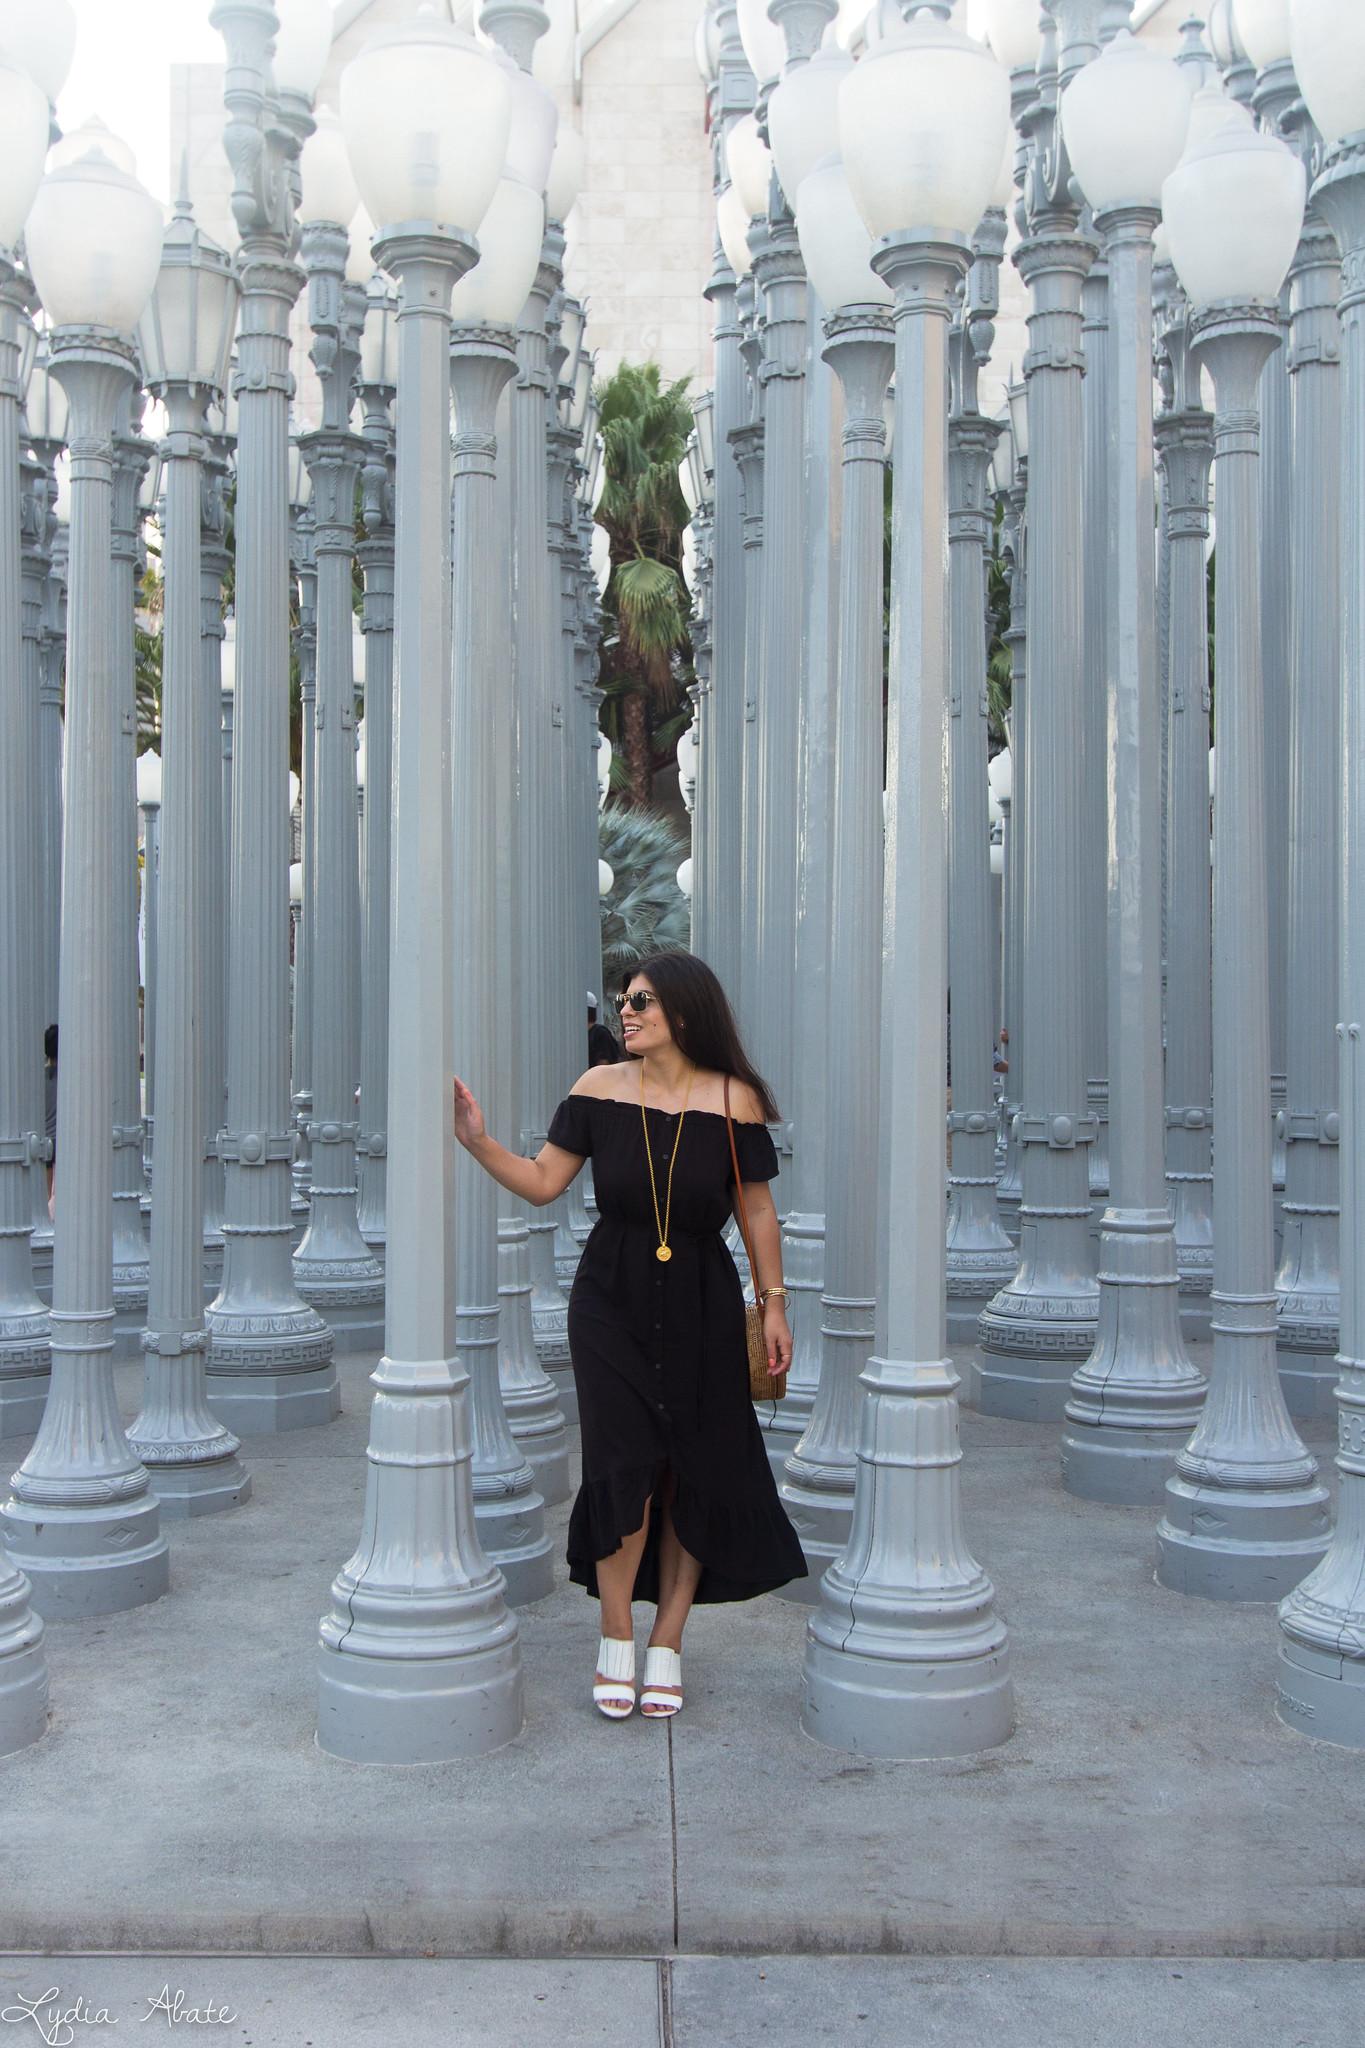 black off the shoulder dress, round rattan bag, urban light-12-Edit-2.jpg